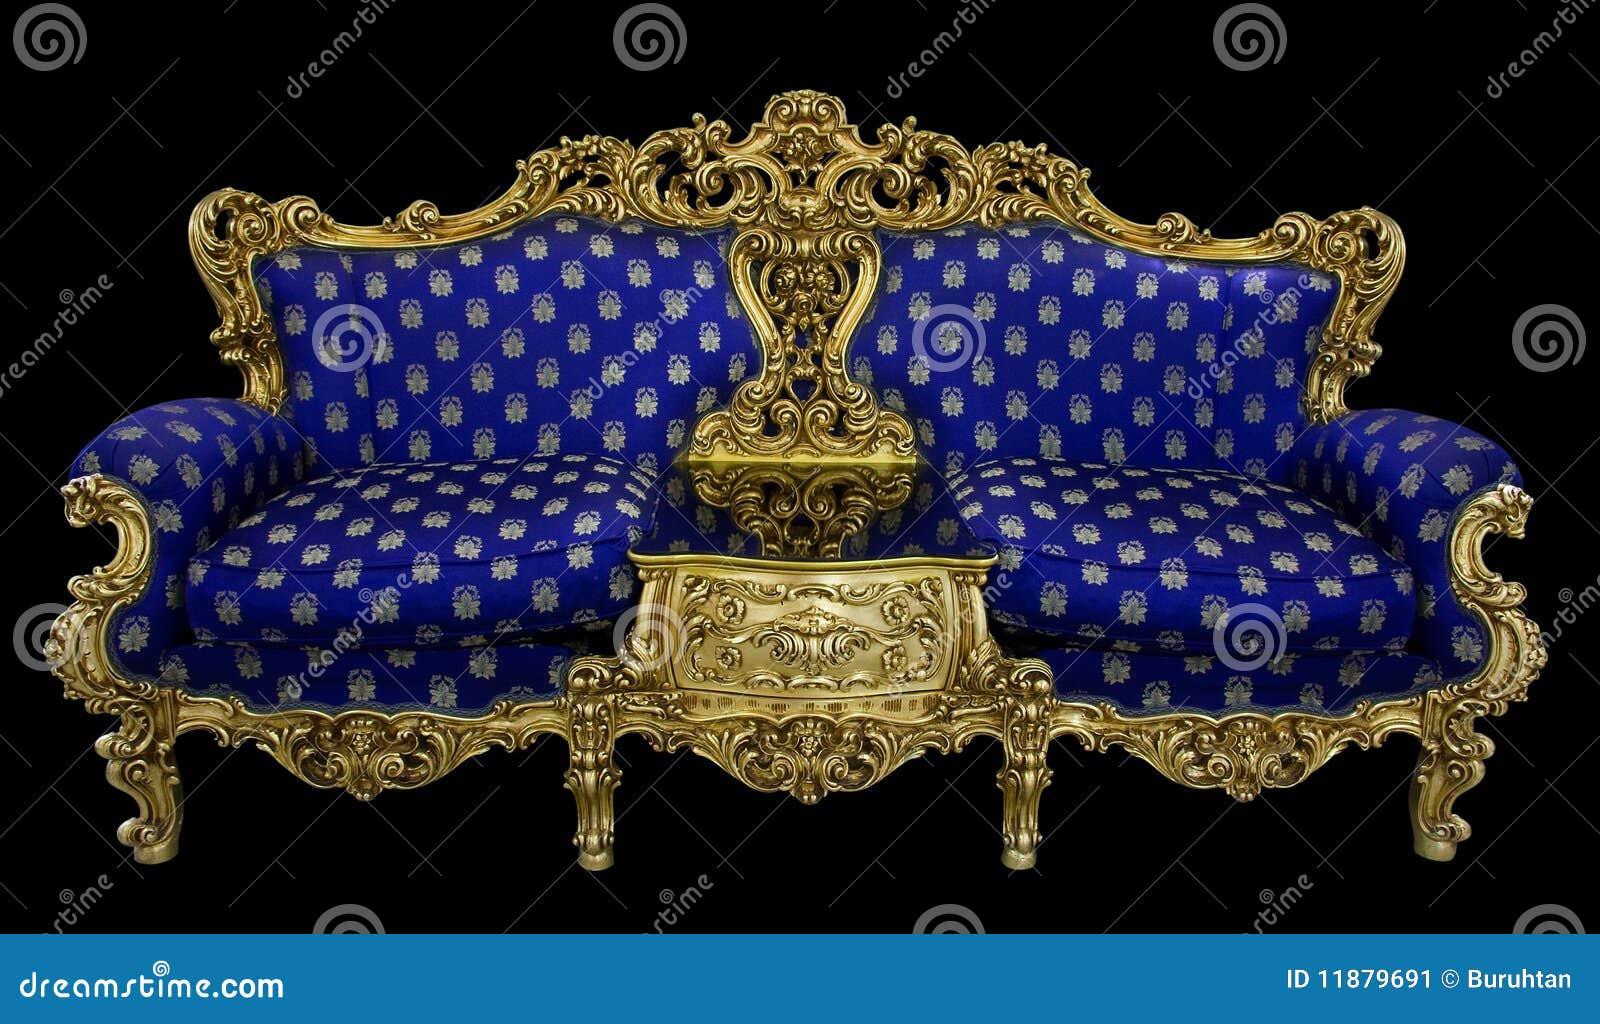 Luksusowa kanapa